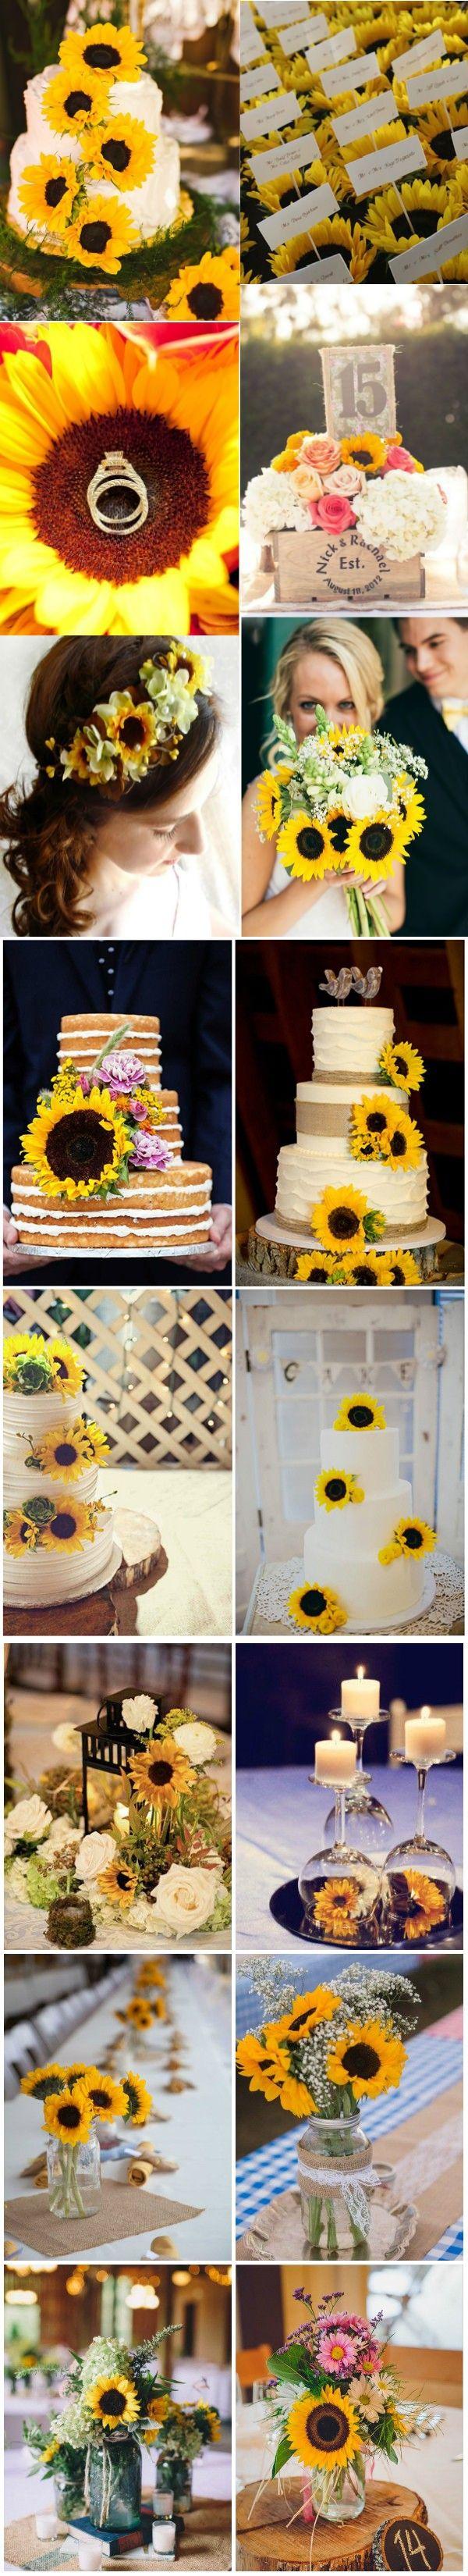 Wedding decorations beach december 2018  Sunflower Wedding Ideas For   That day when  Pinterest